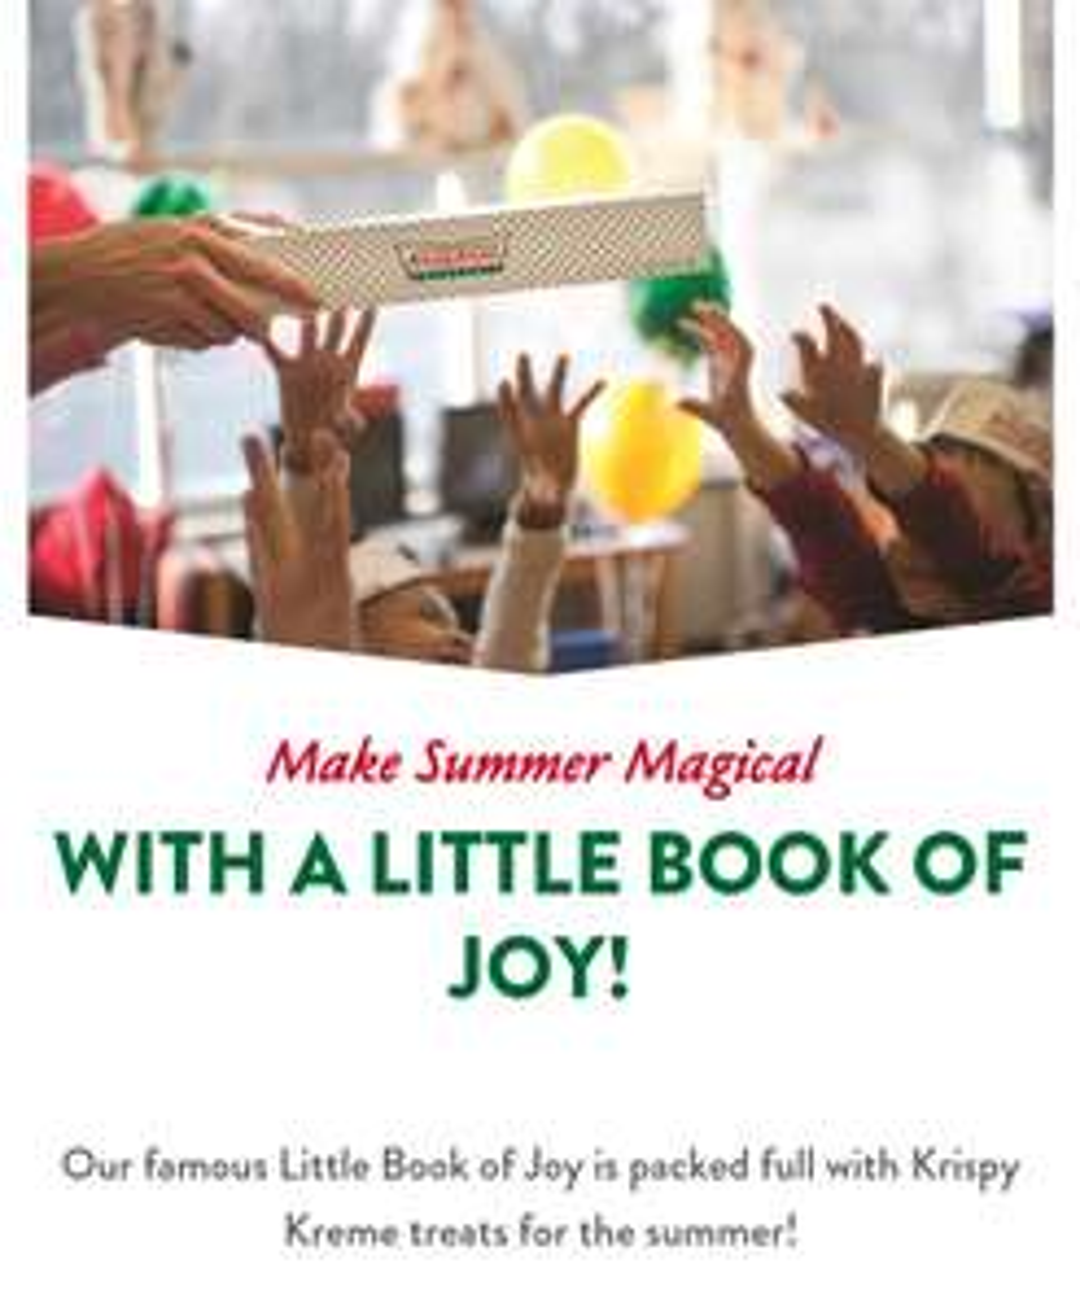 Krispy Kreme Little Book of Joy Summer Offers (50% off Kreme Shake, Buy one get one free doughnuts, £1 off 3-pack and more)